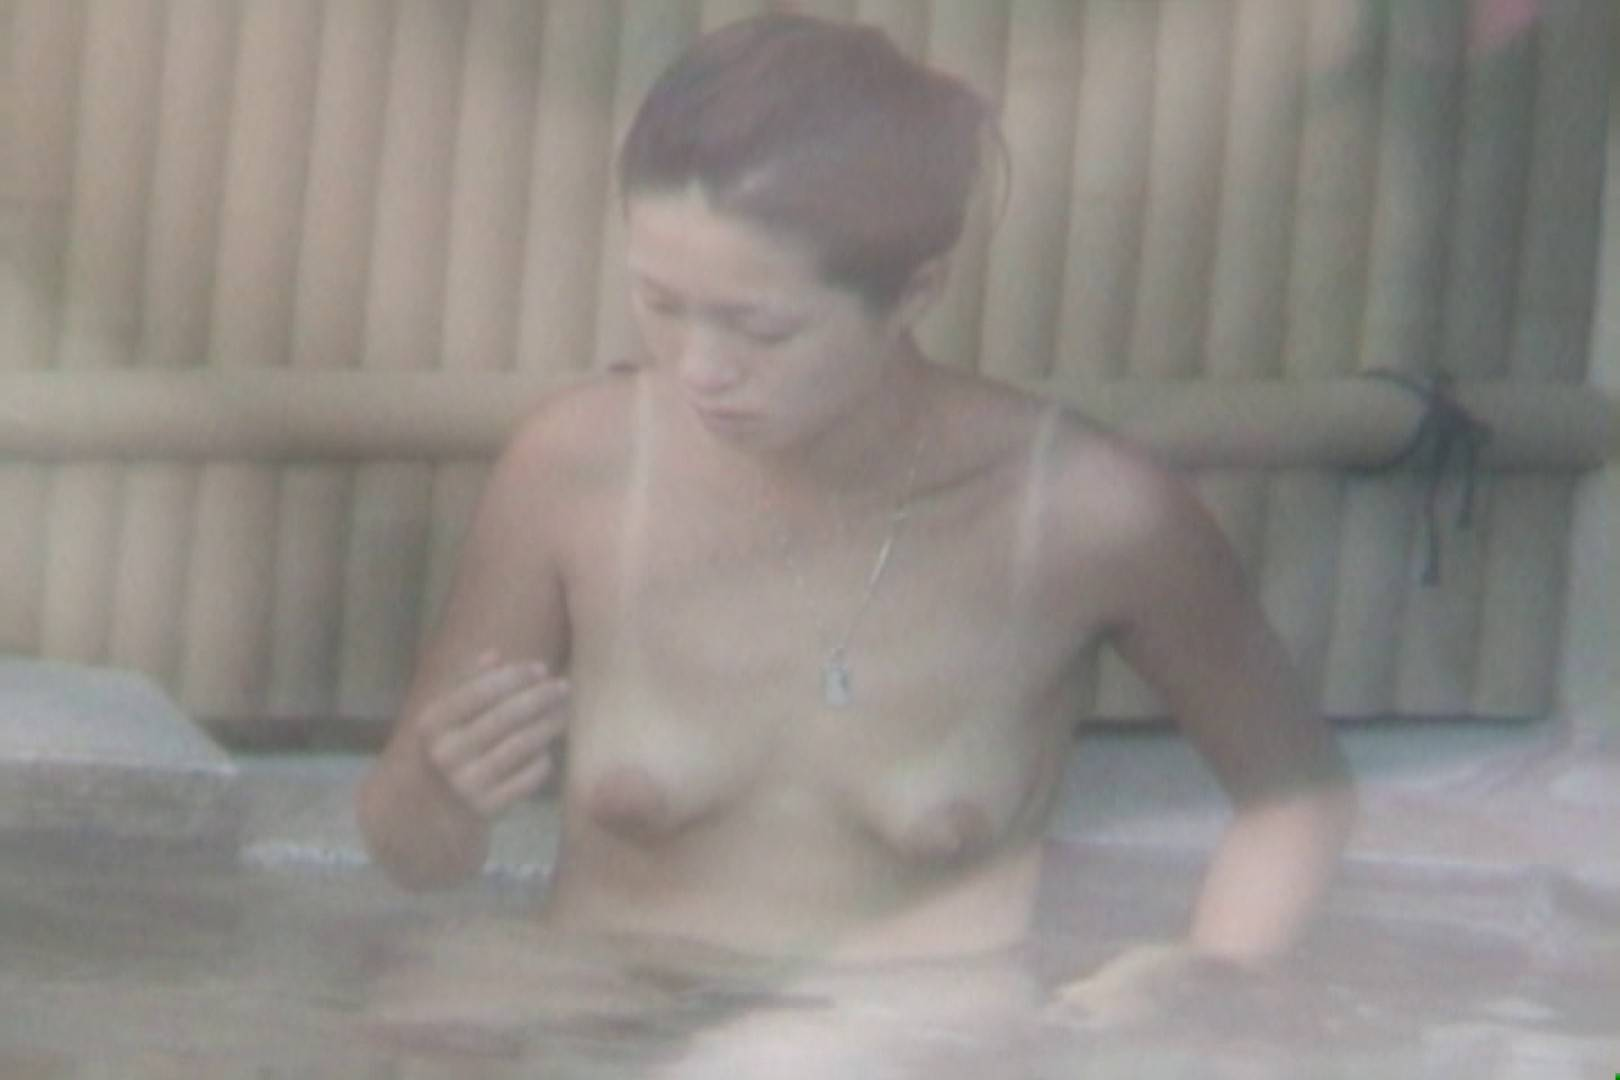 Aquaな露天風呂Vol.571 美しいOLの裸体 | 露天風呂突入  99pic 19